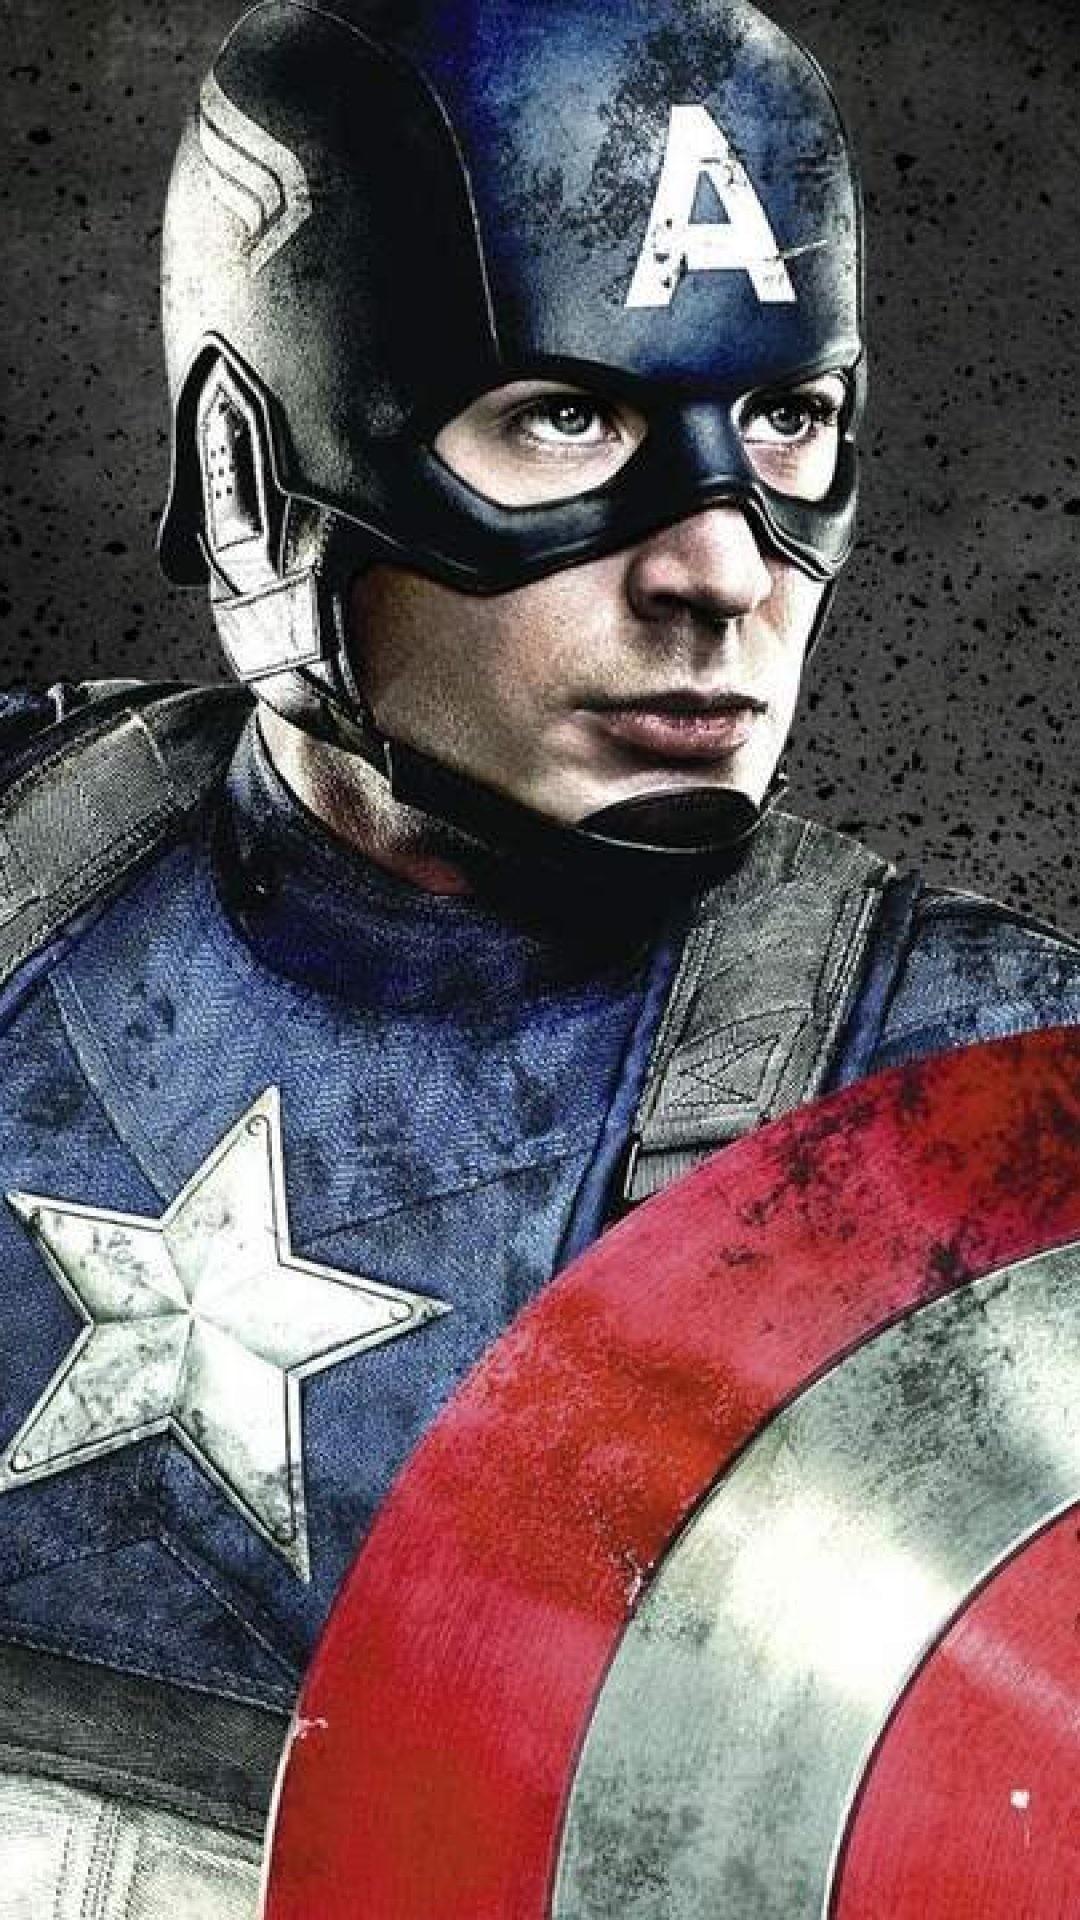 Captain America HD wallpaper | Wallpaper Flare  |Captain America Wallpaper